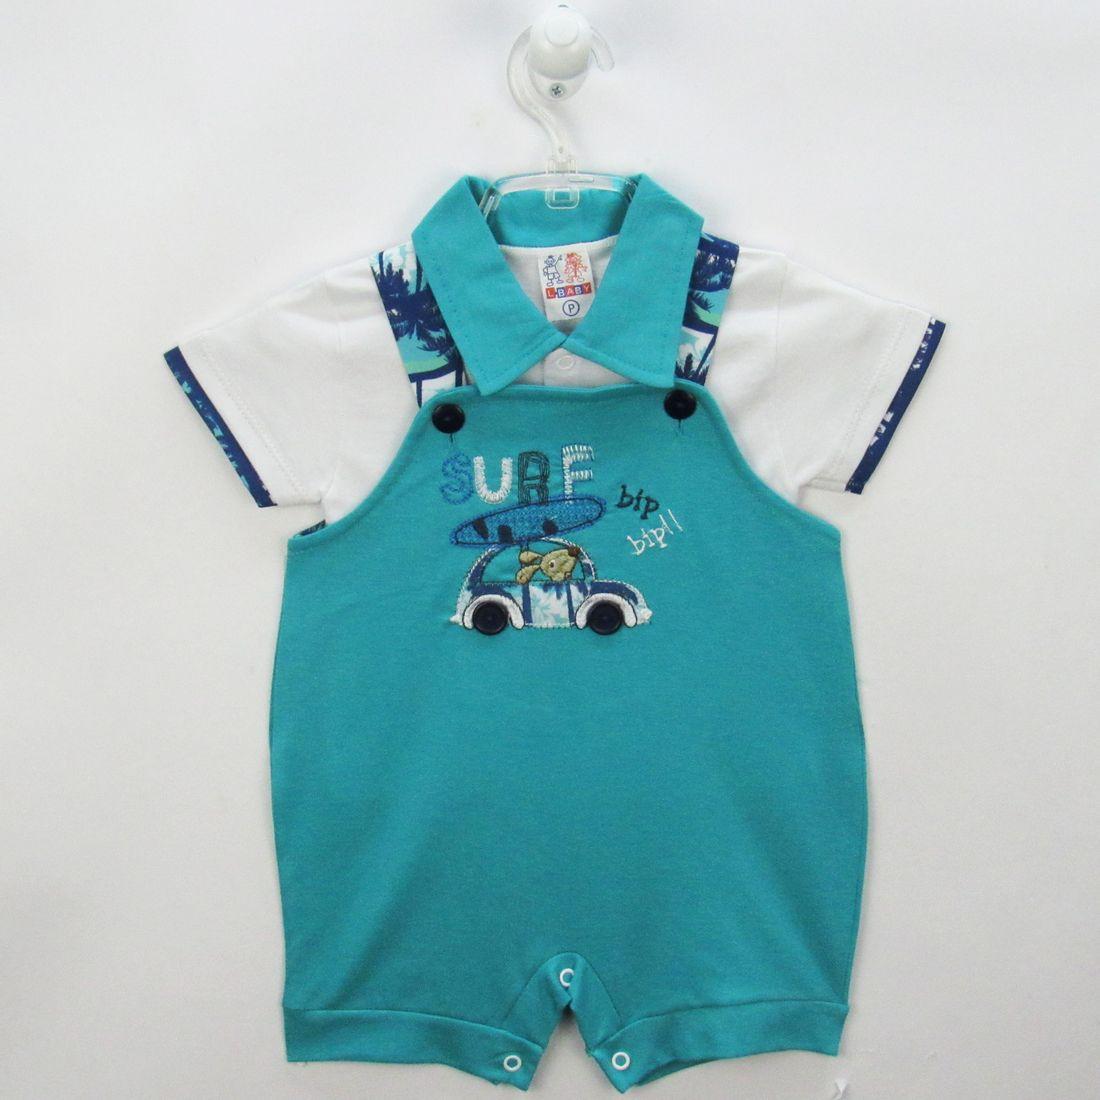 Jardineira Bebê Masculina Curta Malha Verde Mar e Camiseta ... 56f7418e894